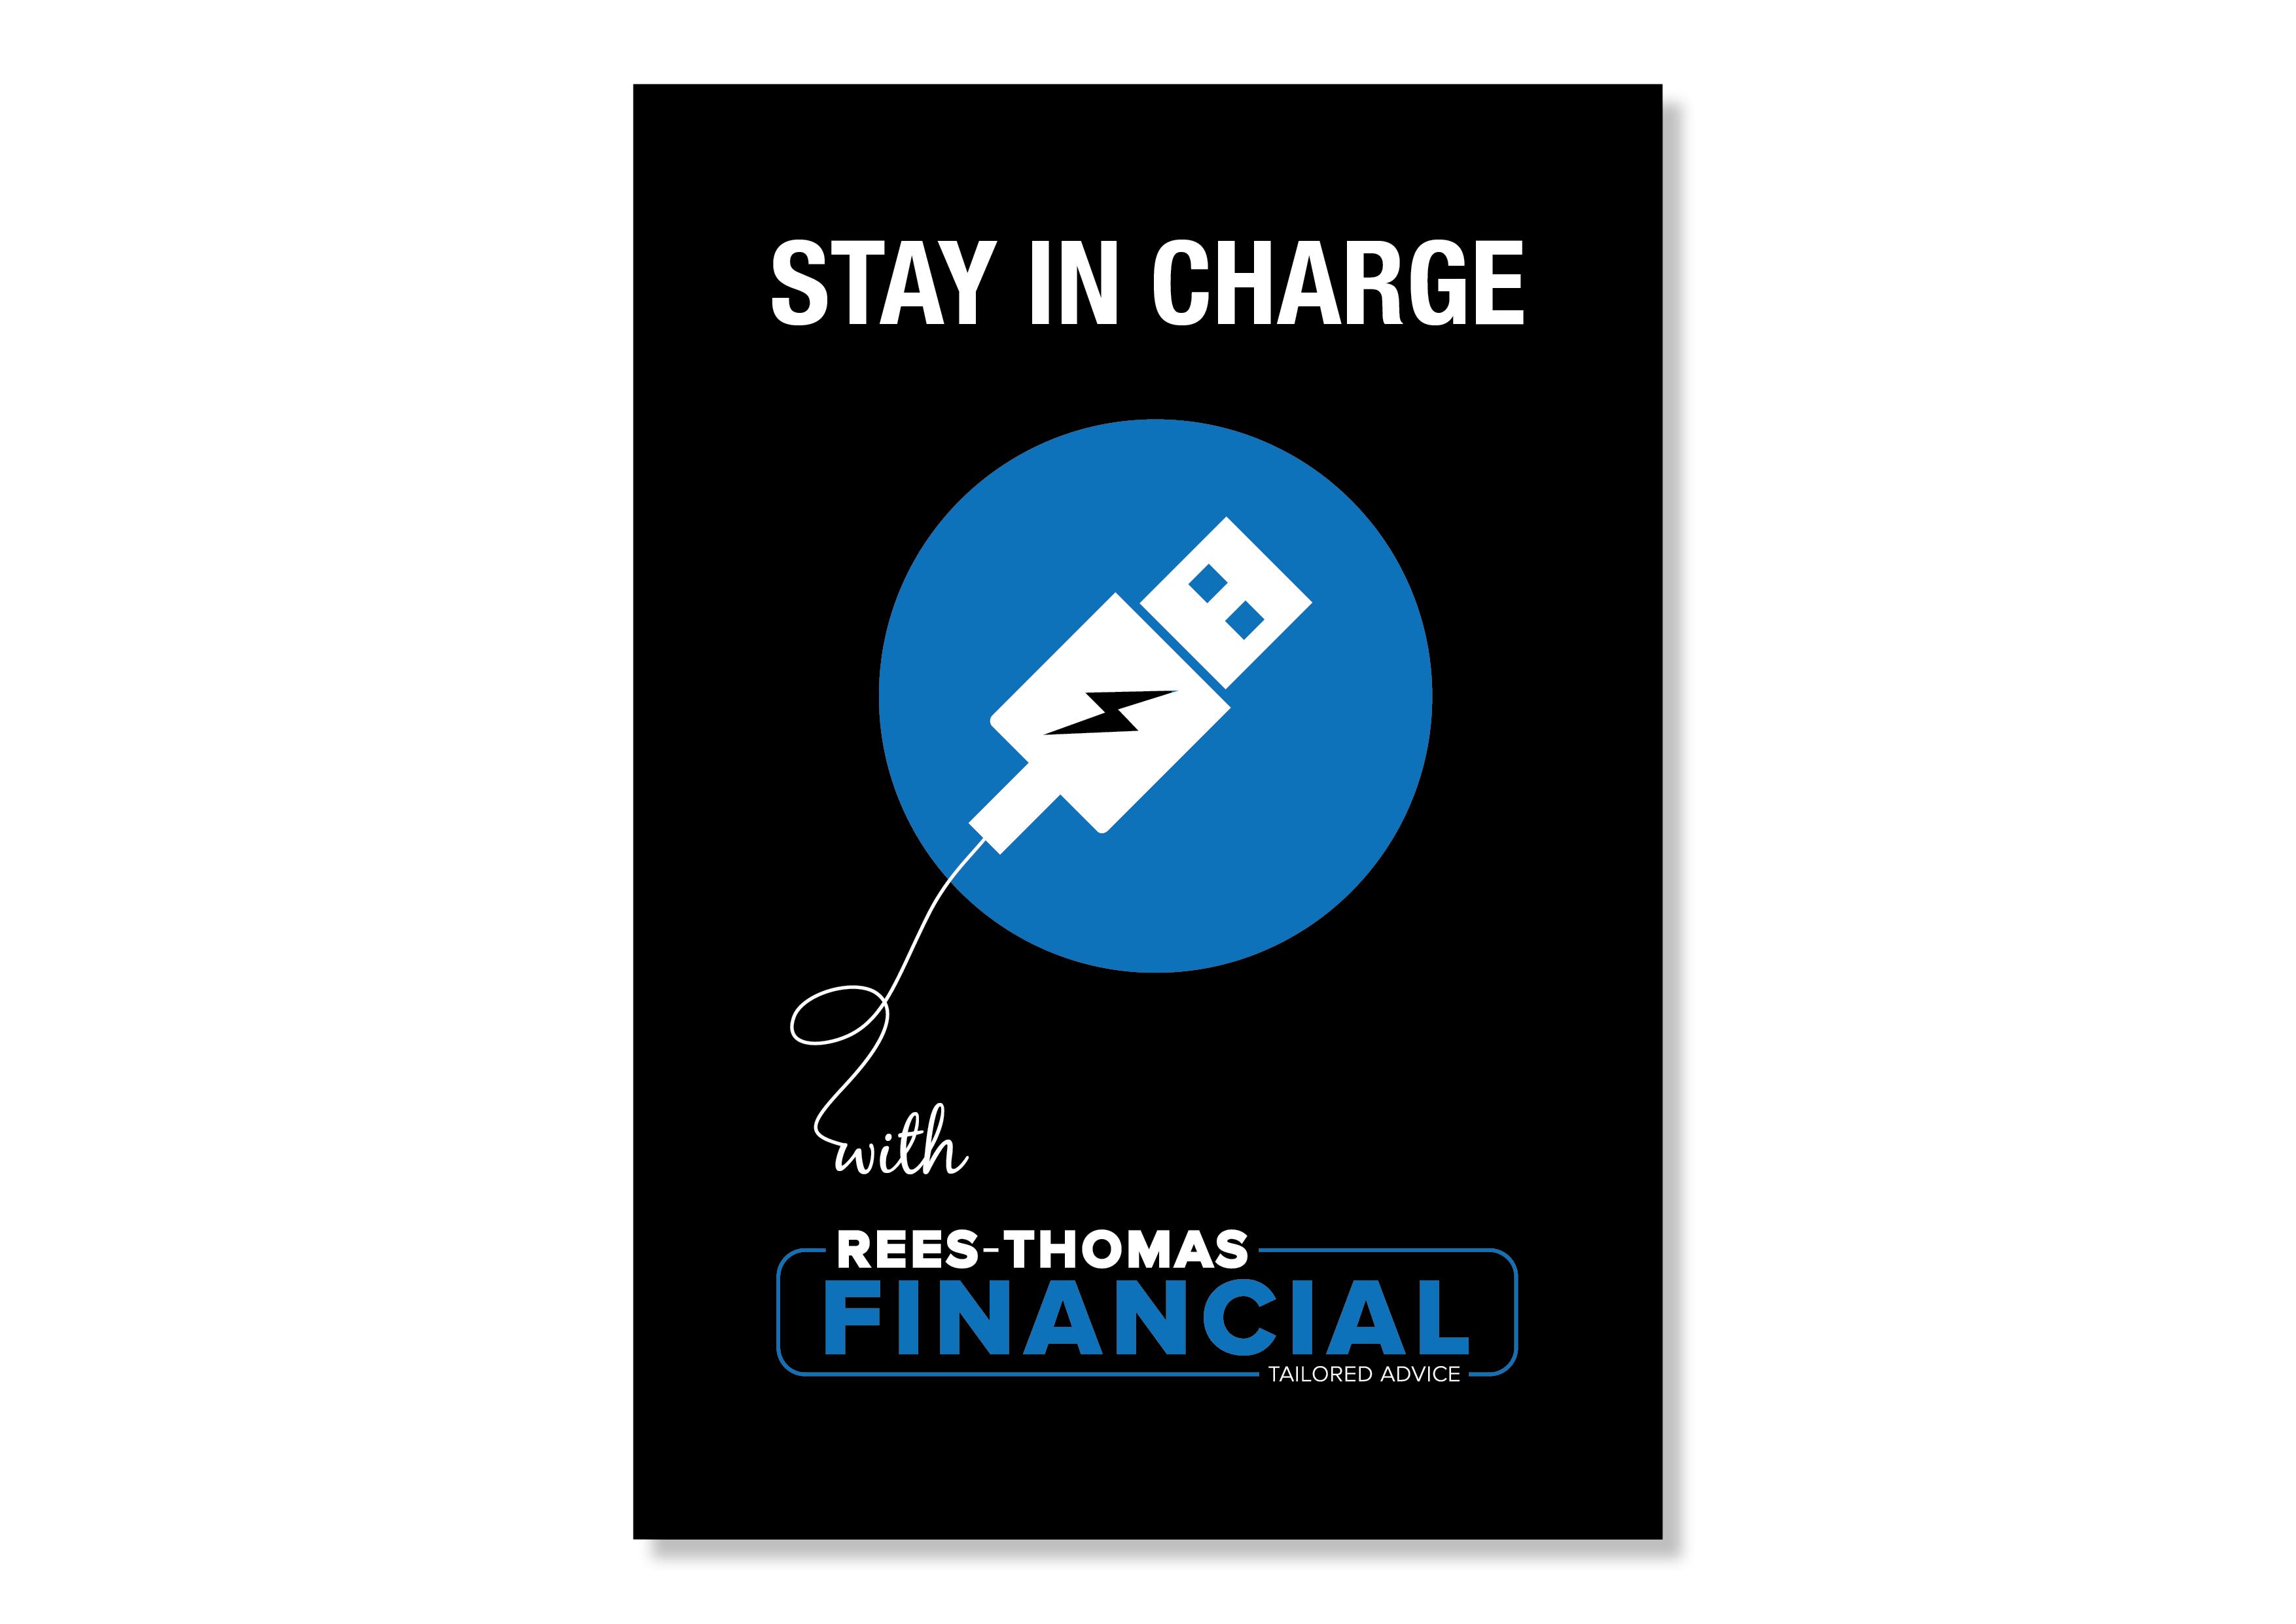 Rees-Thomas financial